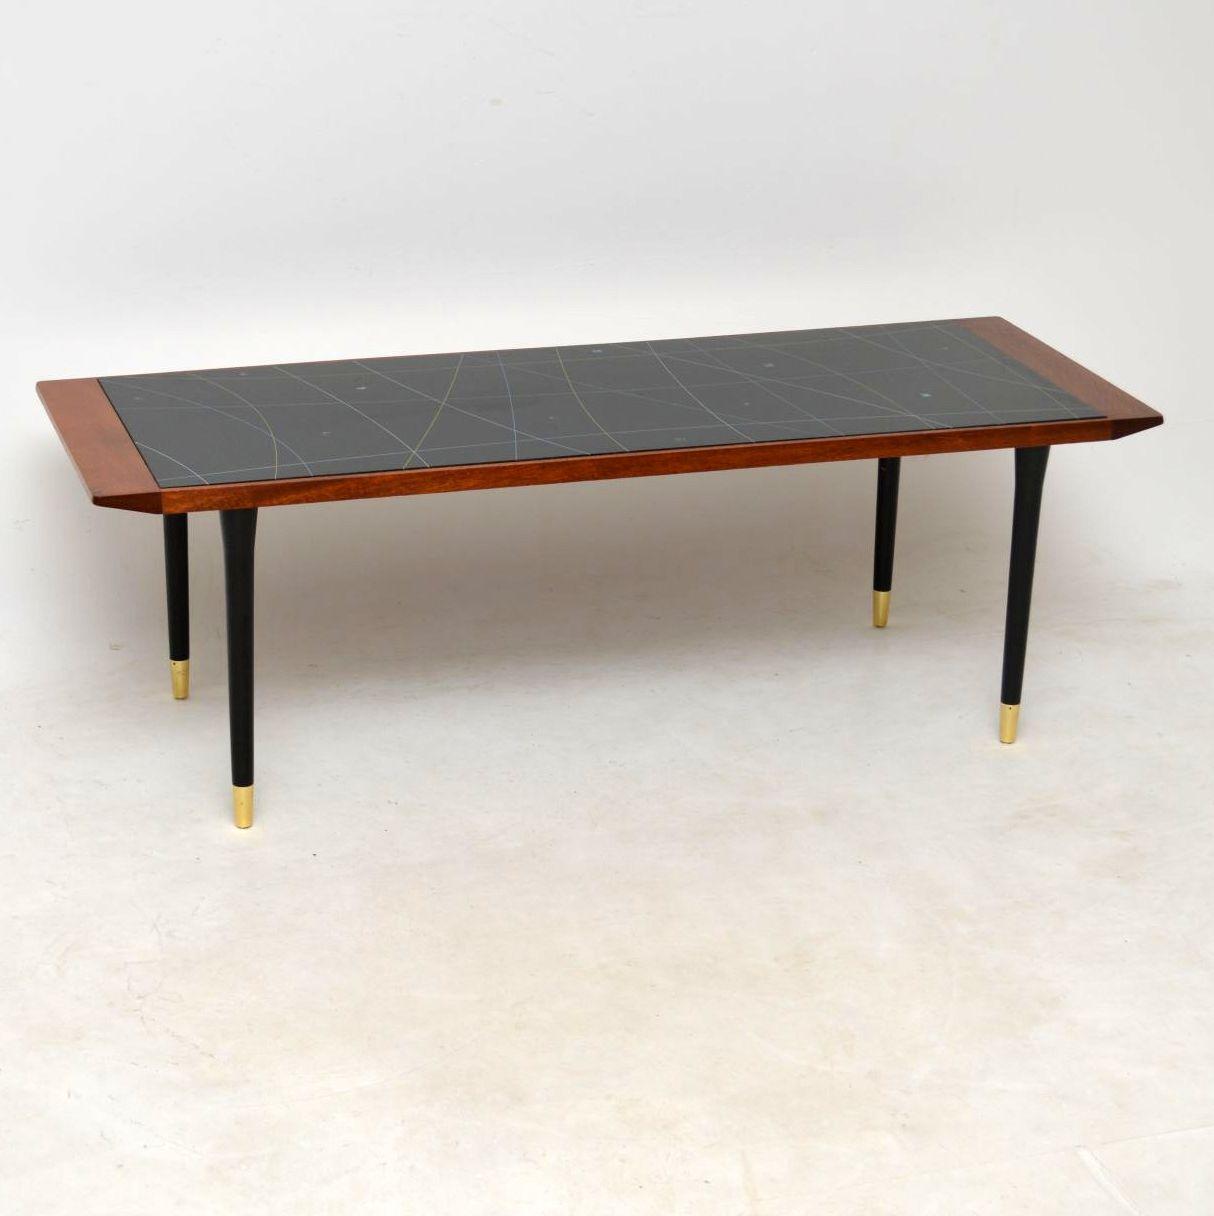 1950's Vintage Teak Glass Top Coffee Table